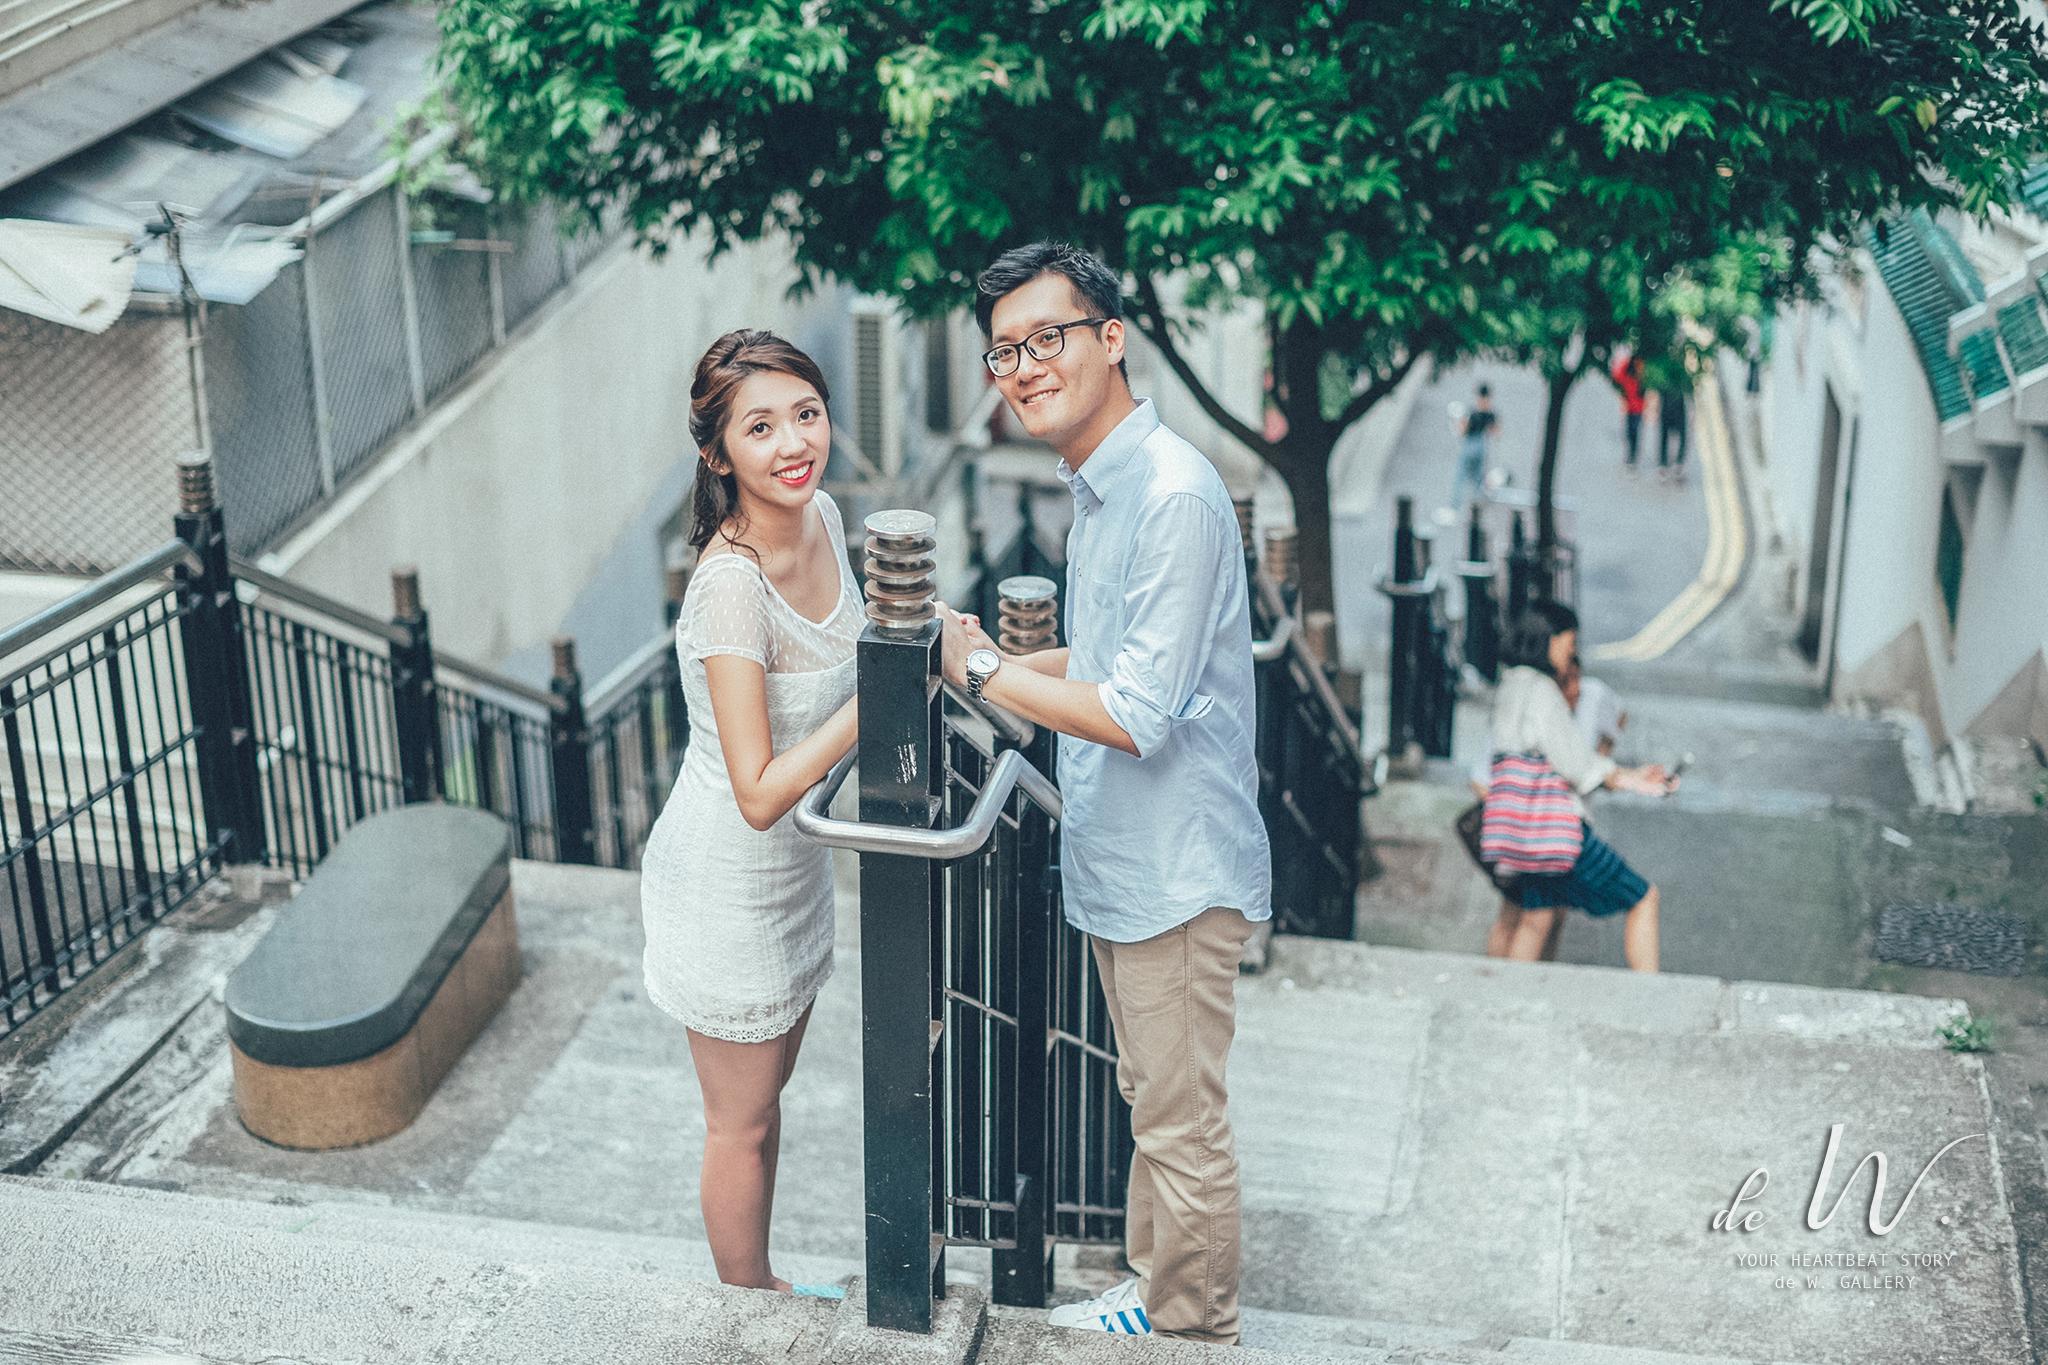 2048 de w gallery Film style hong kong 底片 拍拖 engagement vsco 故事 中環 西環 central-12